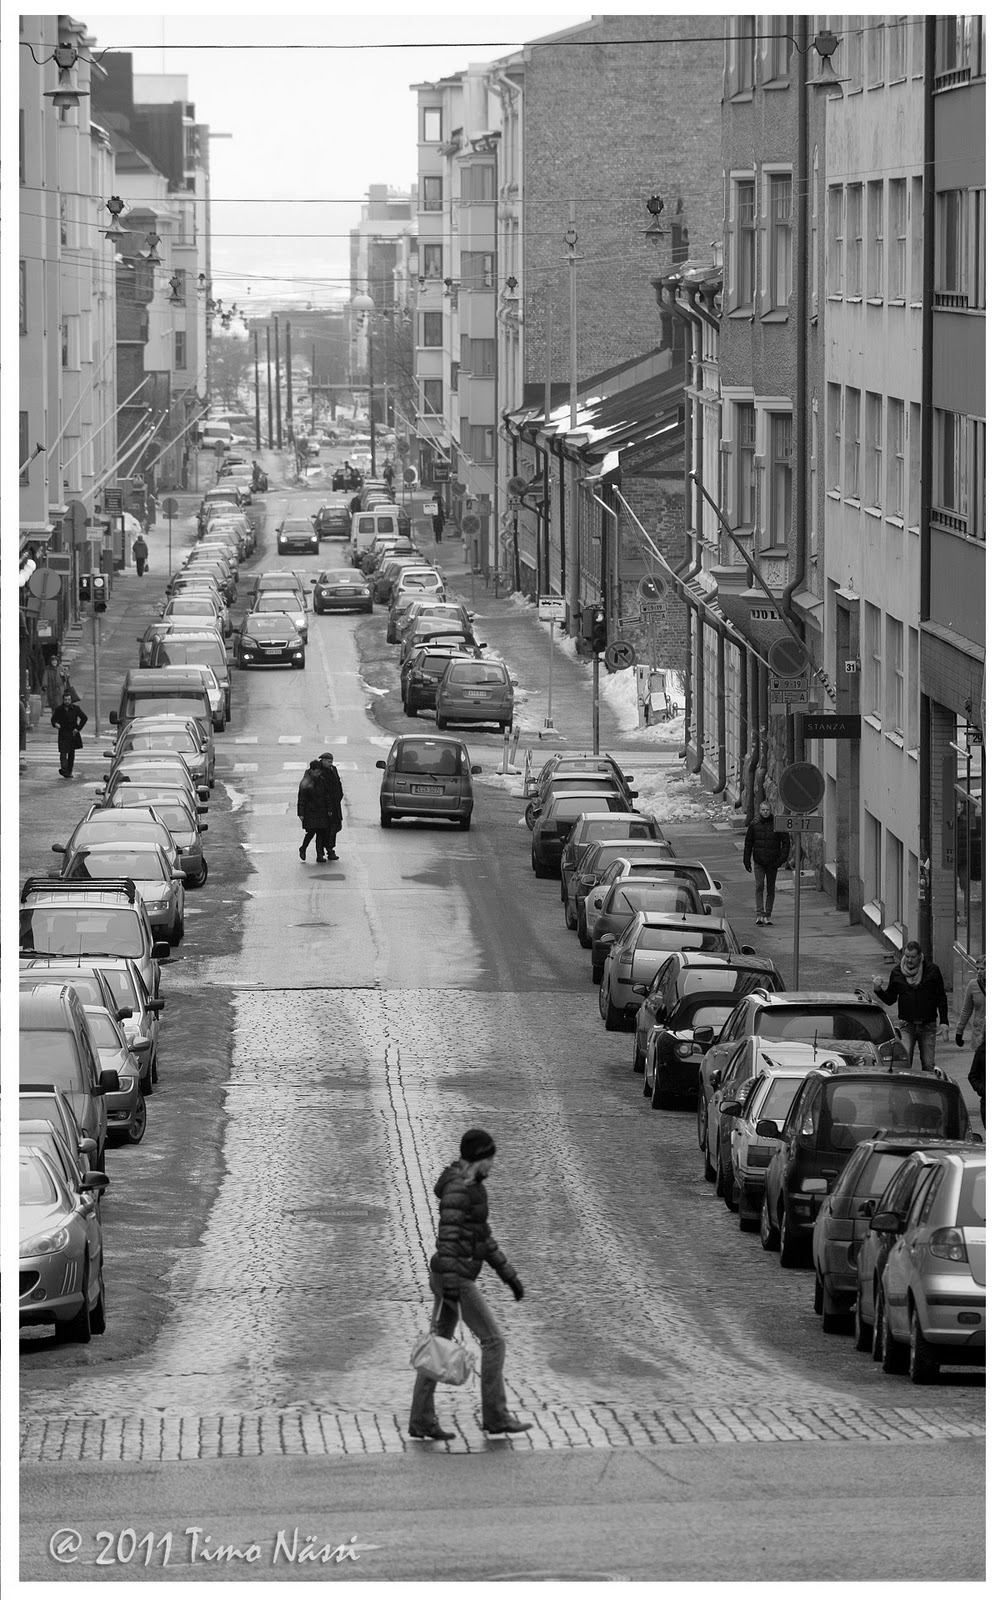 VALOKUVAUS: Valokuvaus: Helsinki